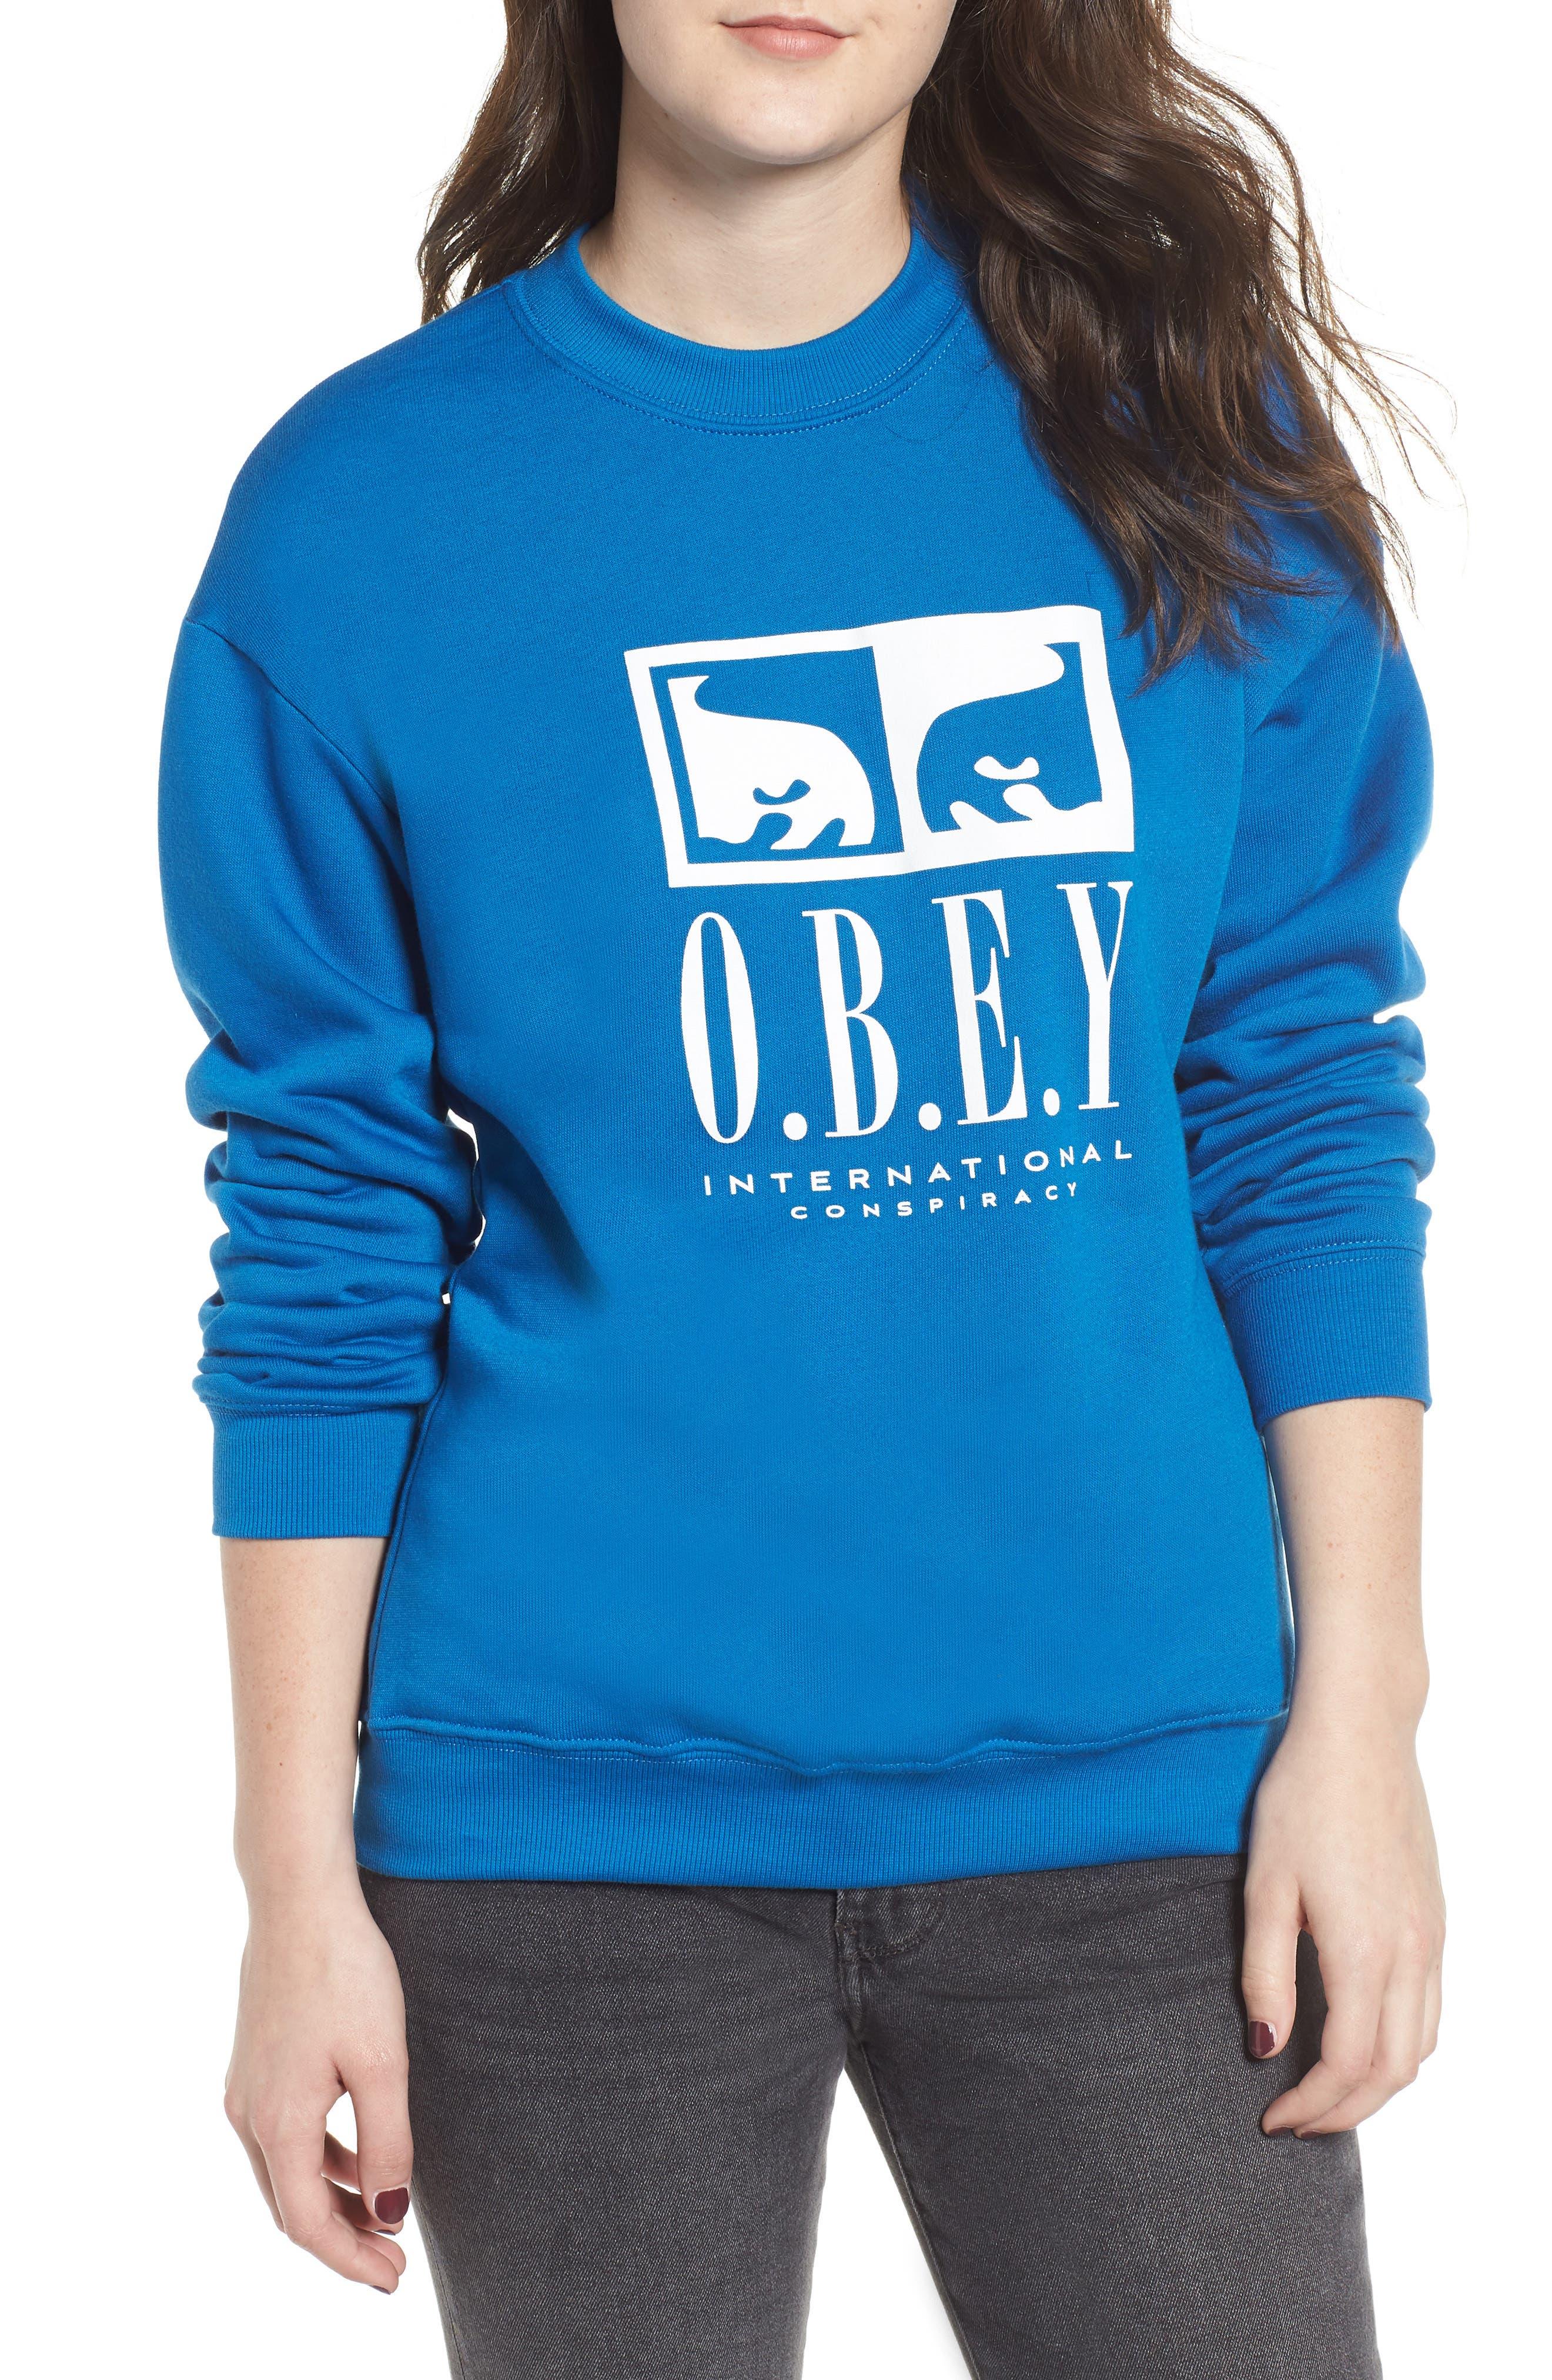 OBEY International Conspiracy Sweatshirt in Sapphire